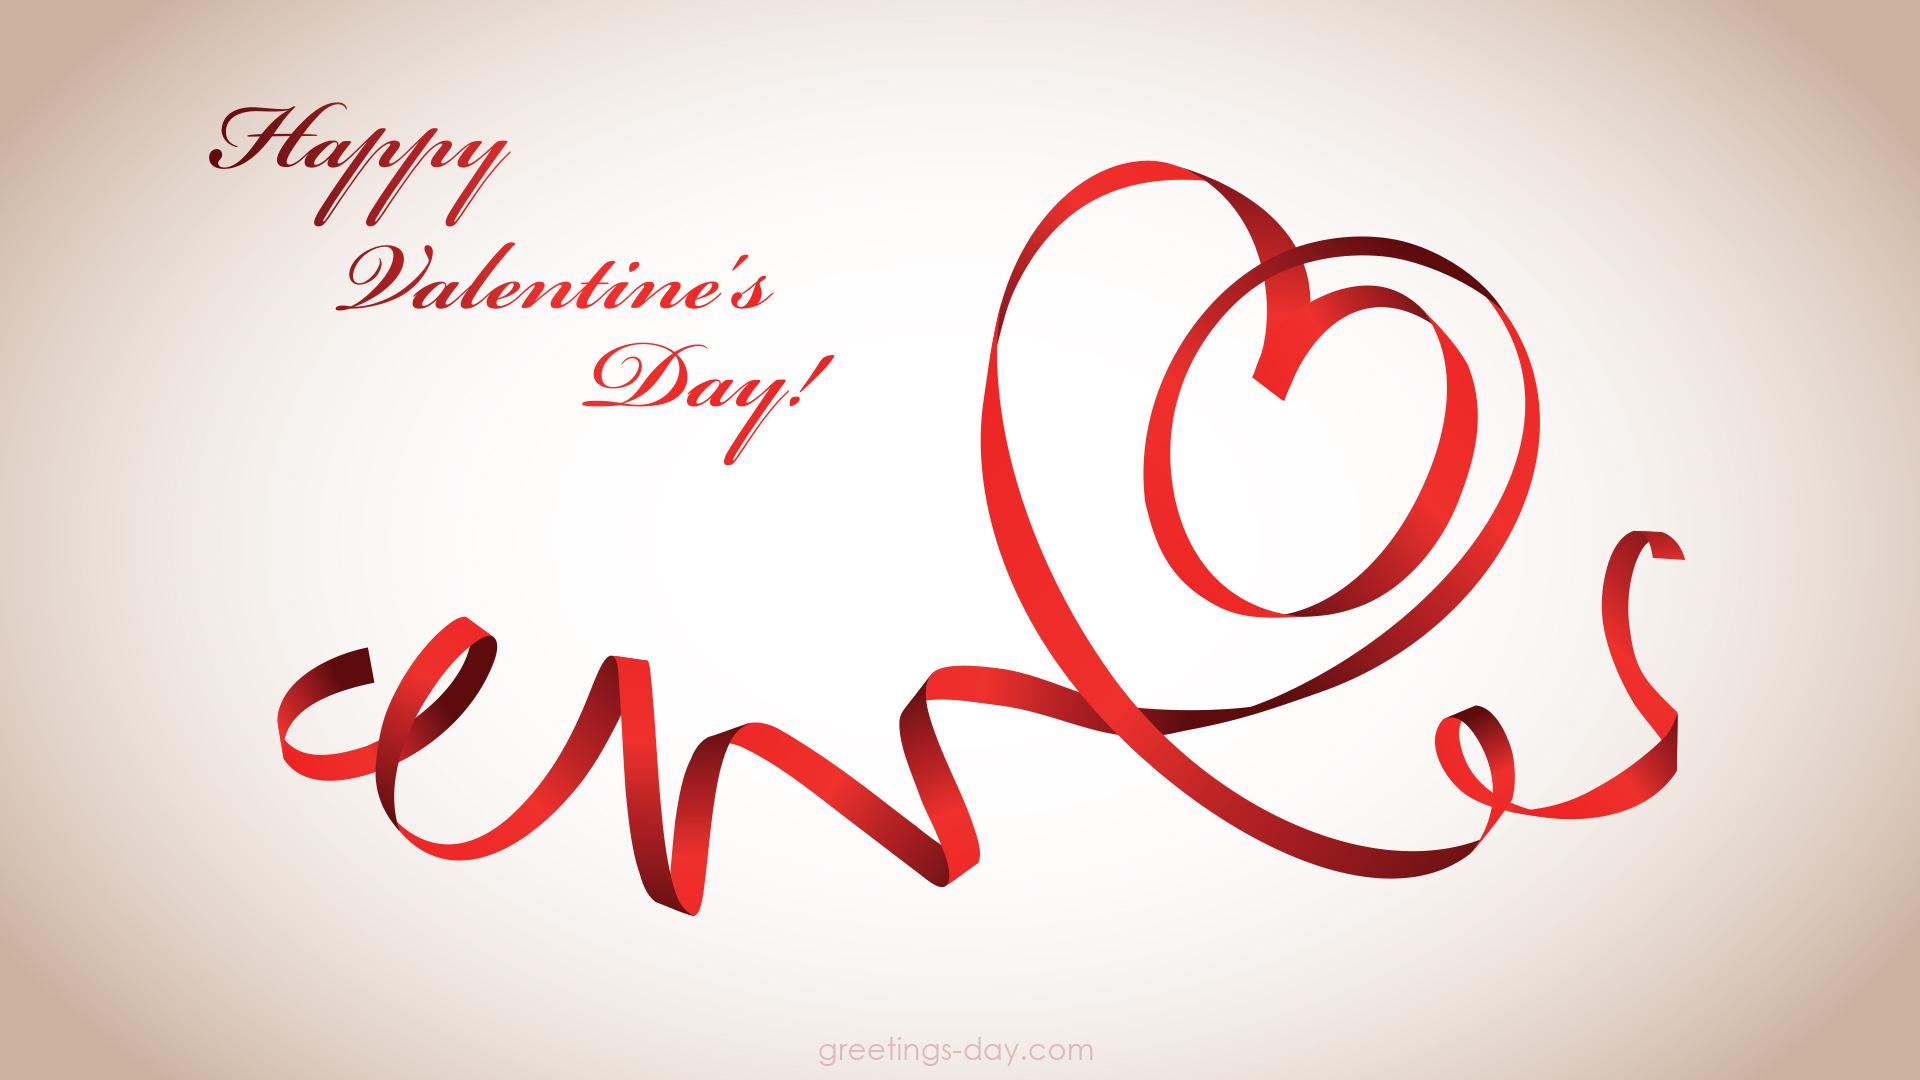 Happy Valentines days cards